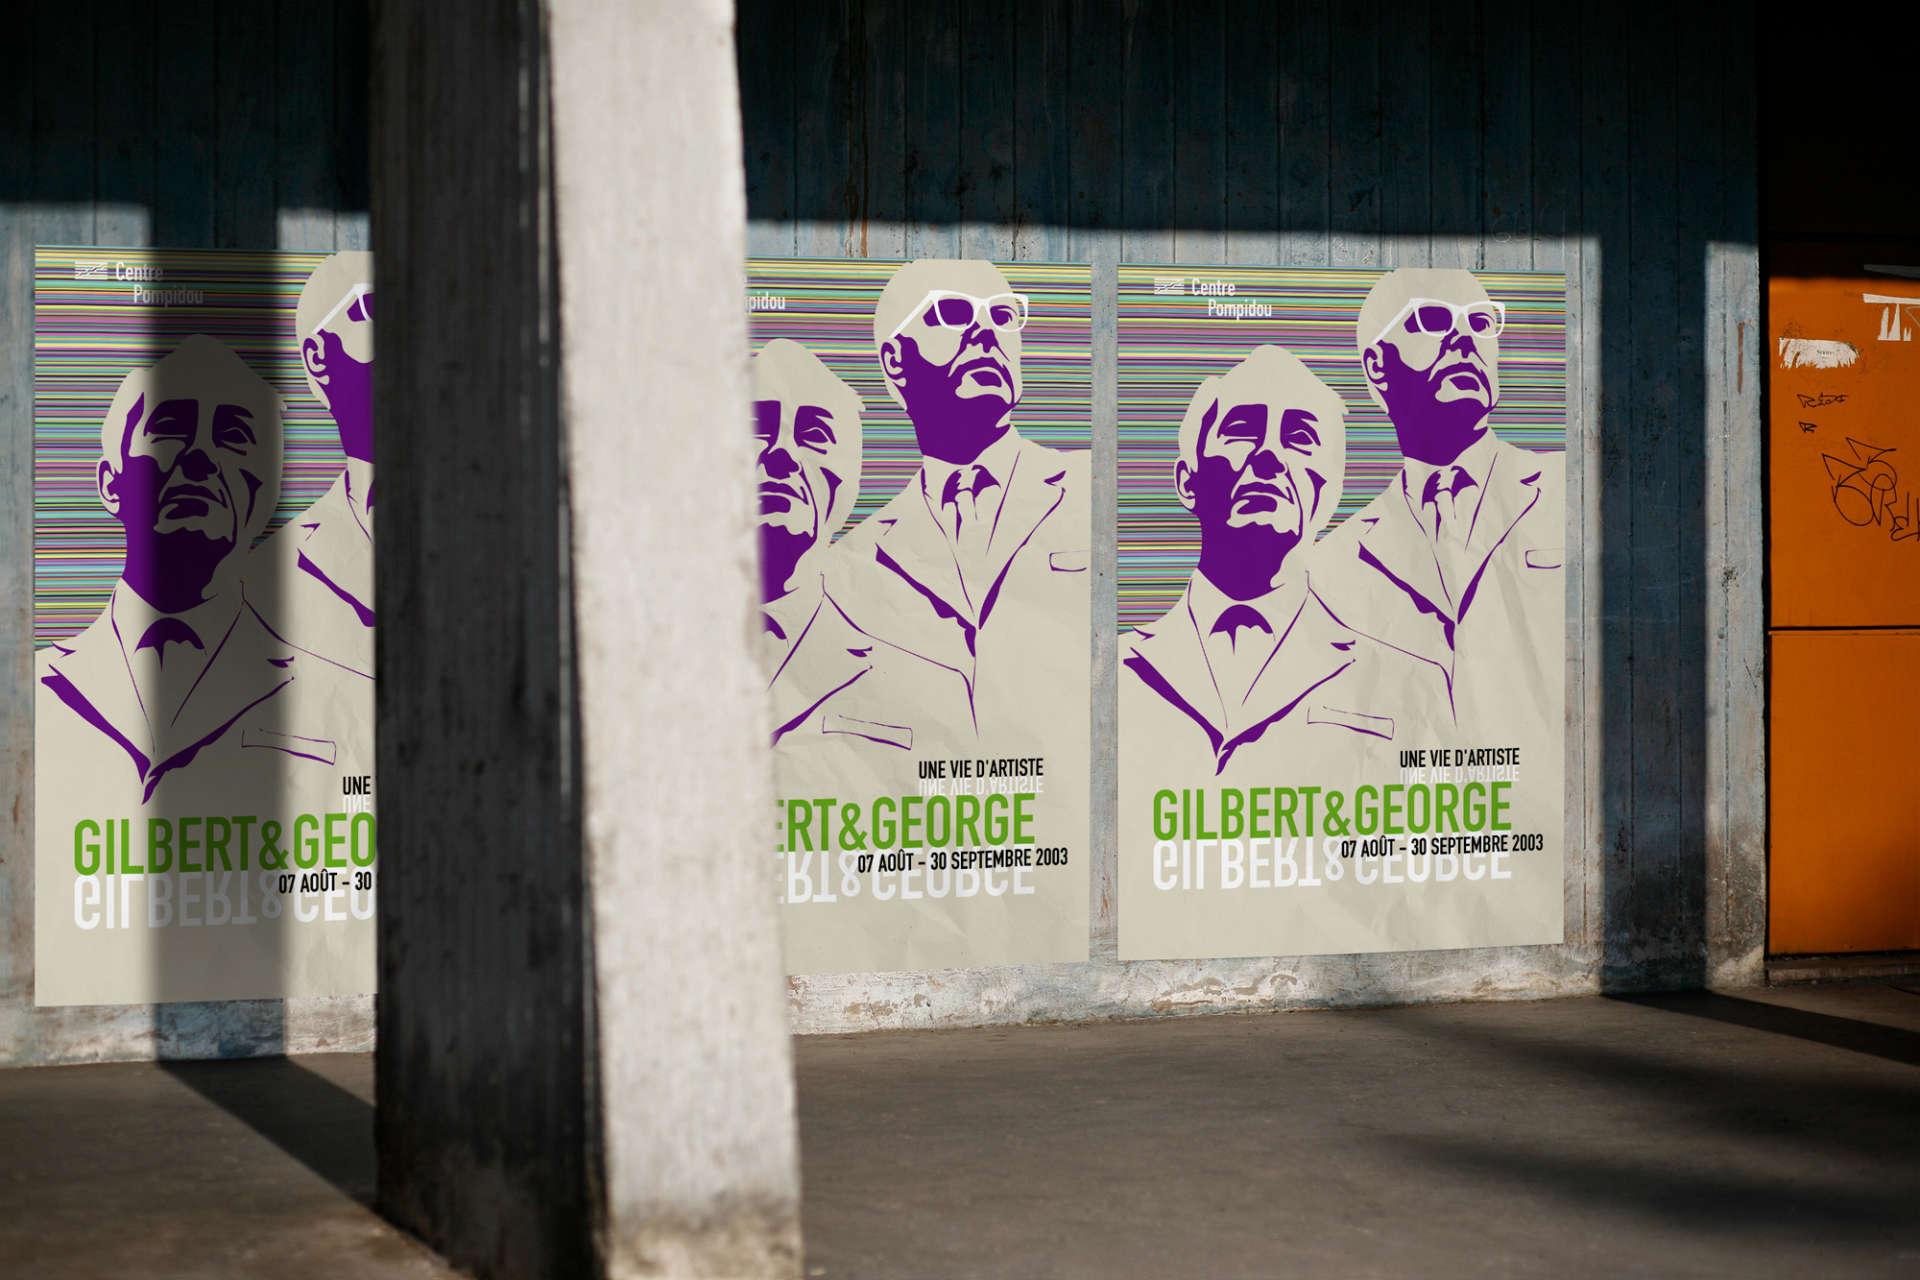 Gilbert&George-book-mockup-ville-02